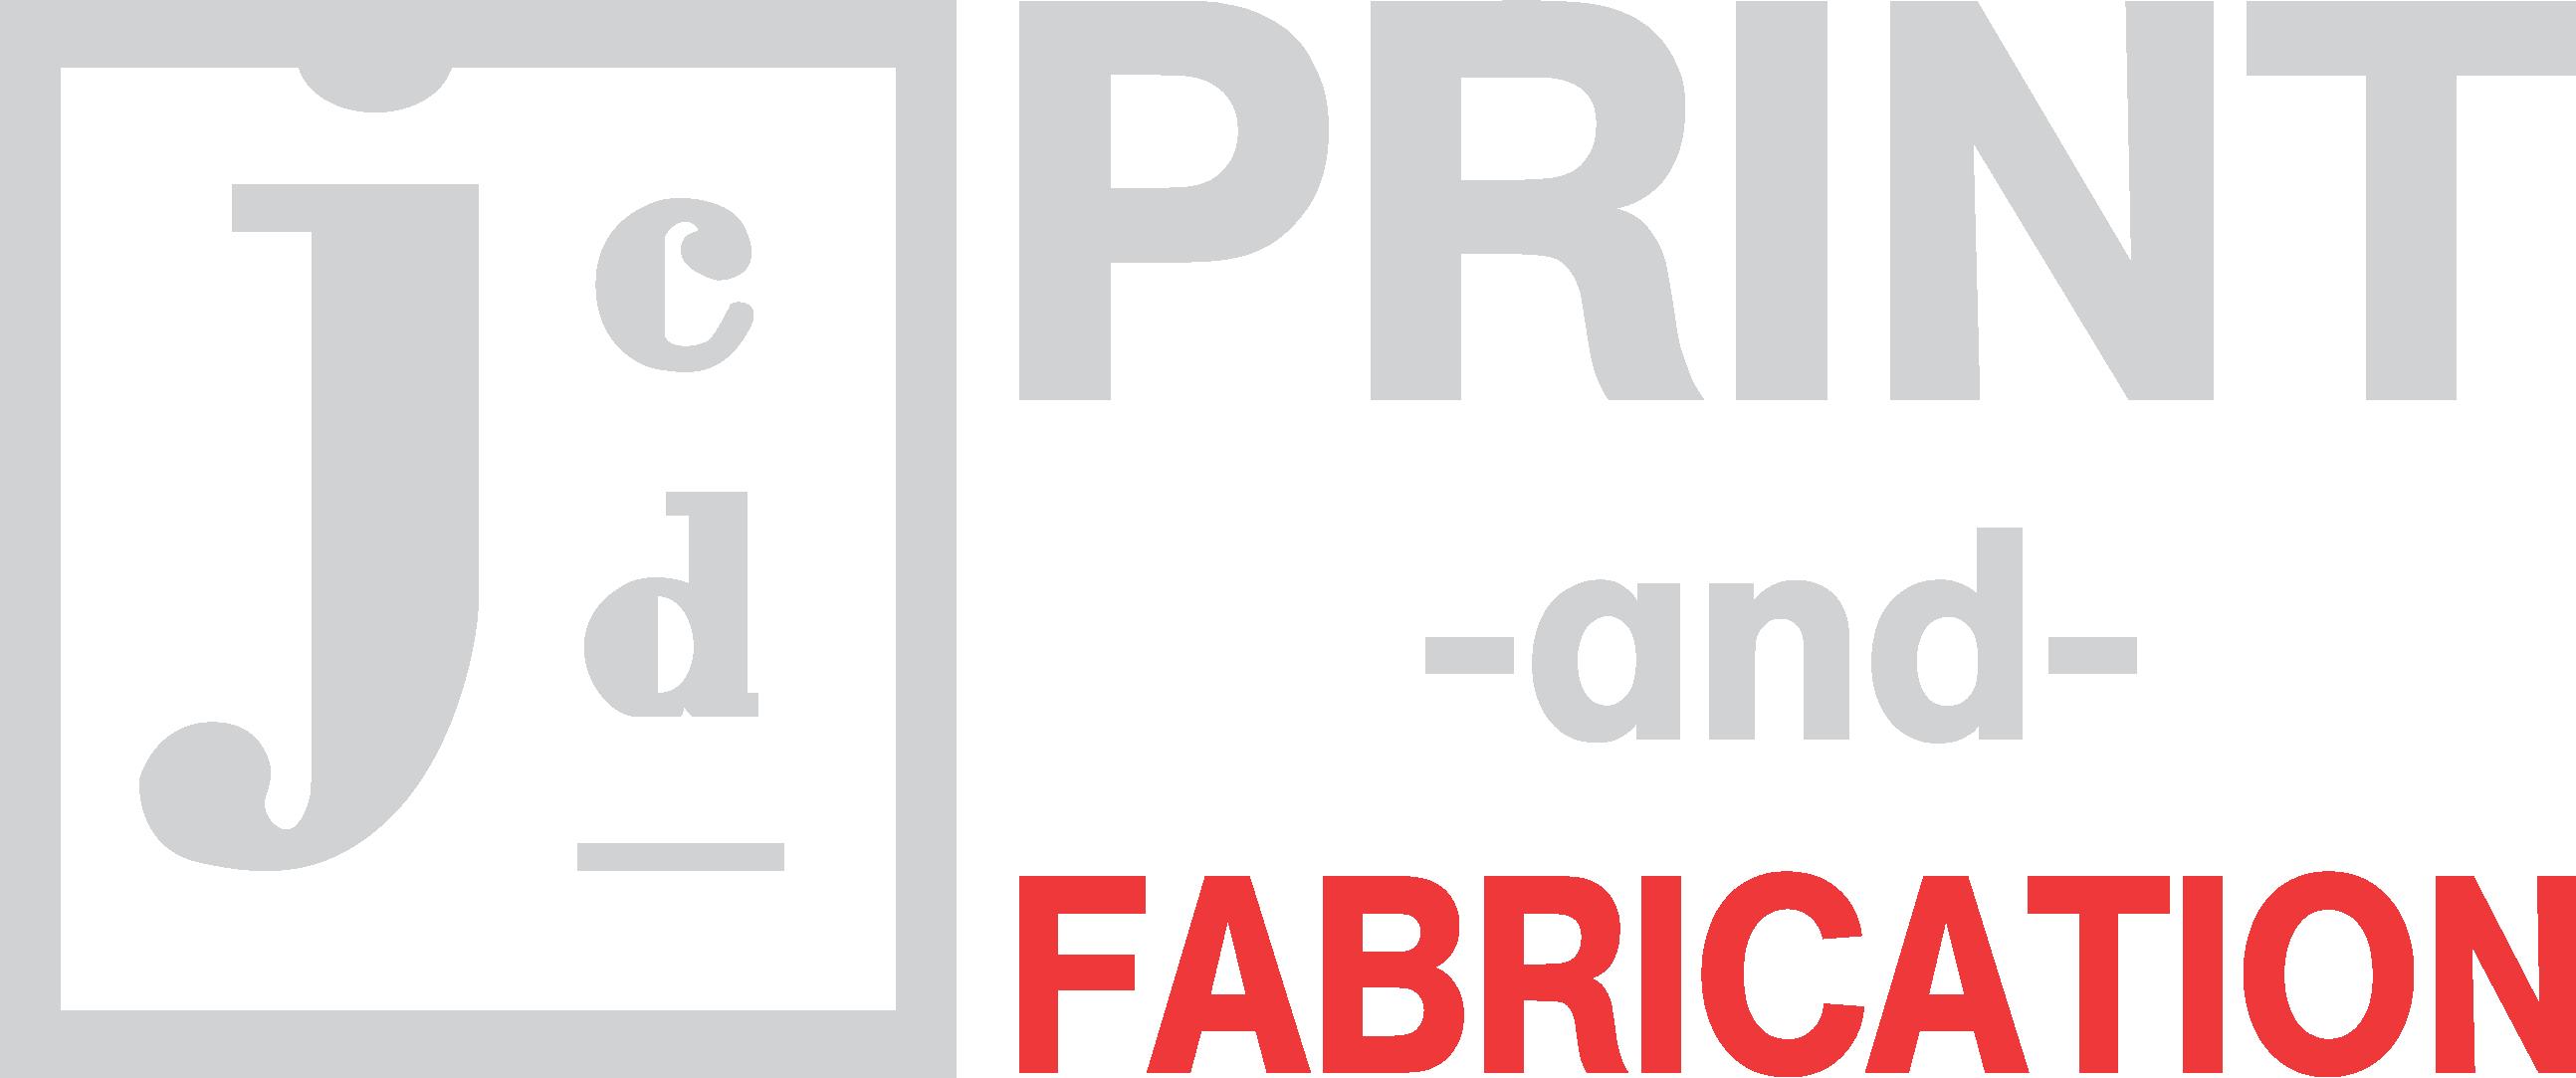 JCD Print and Fabrication